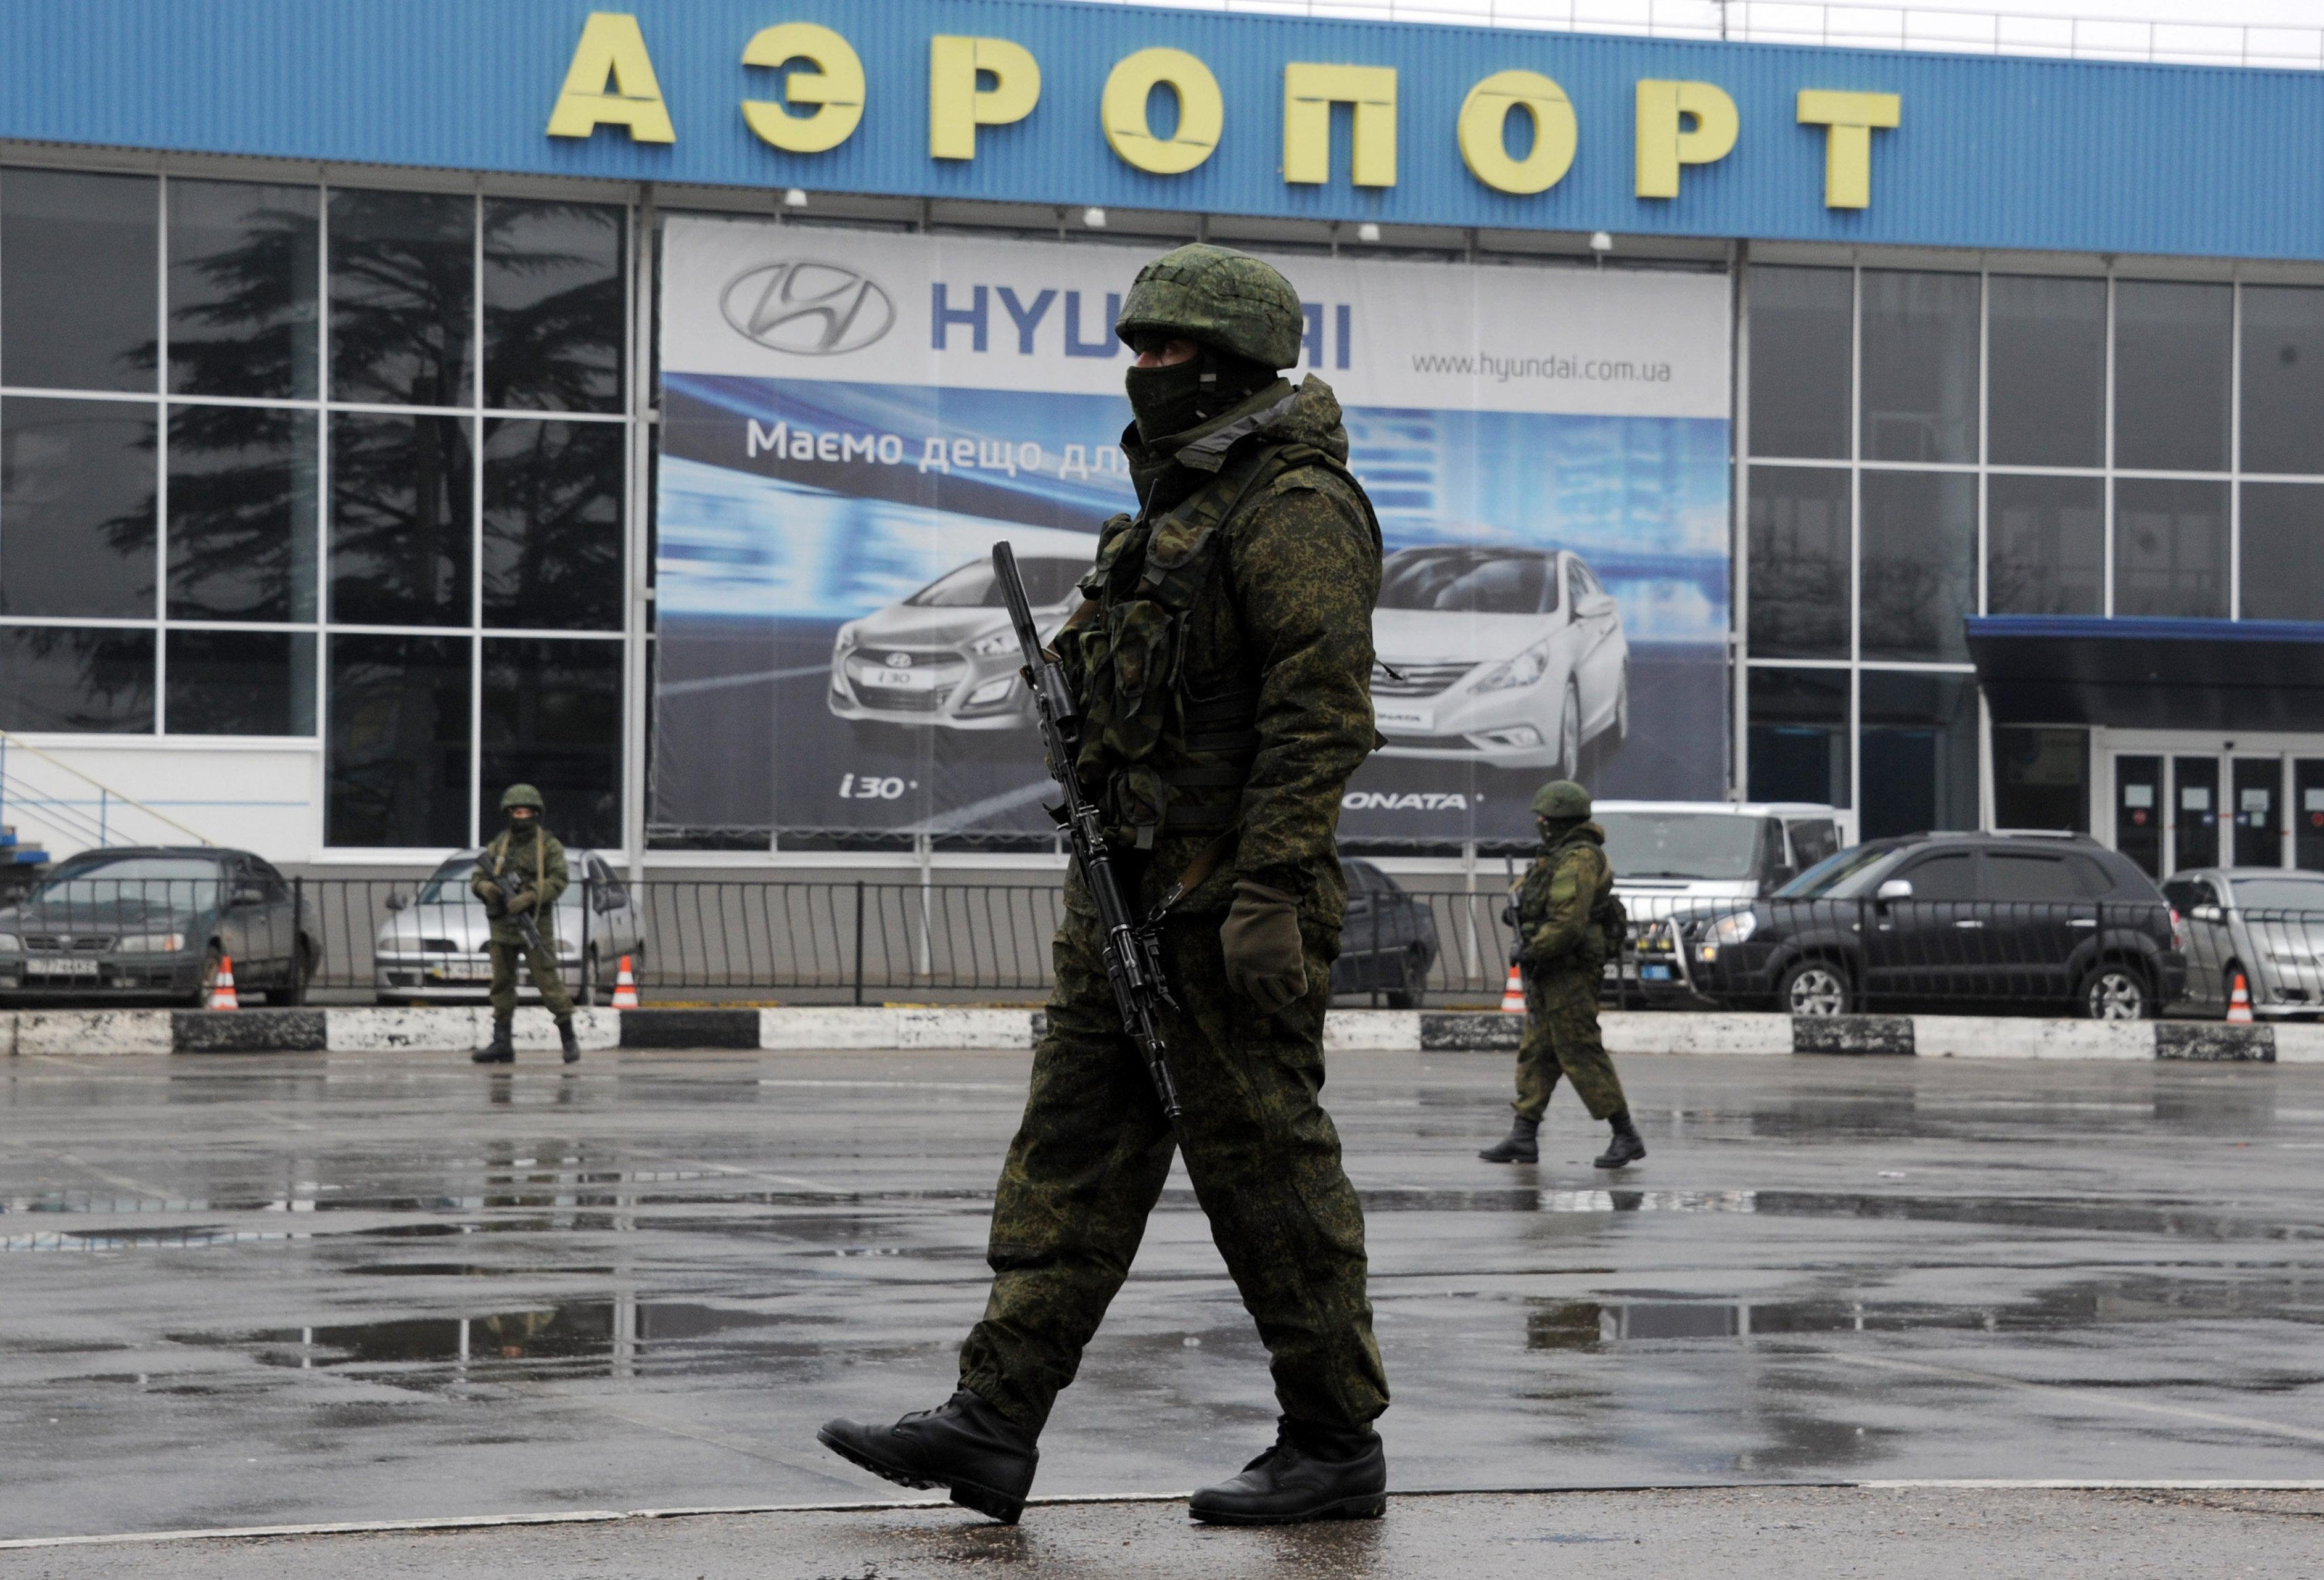 Unidentified armed men patrol outside of Simferopol airport, on February 28, 2014